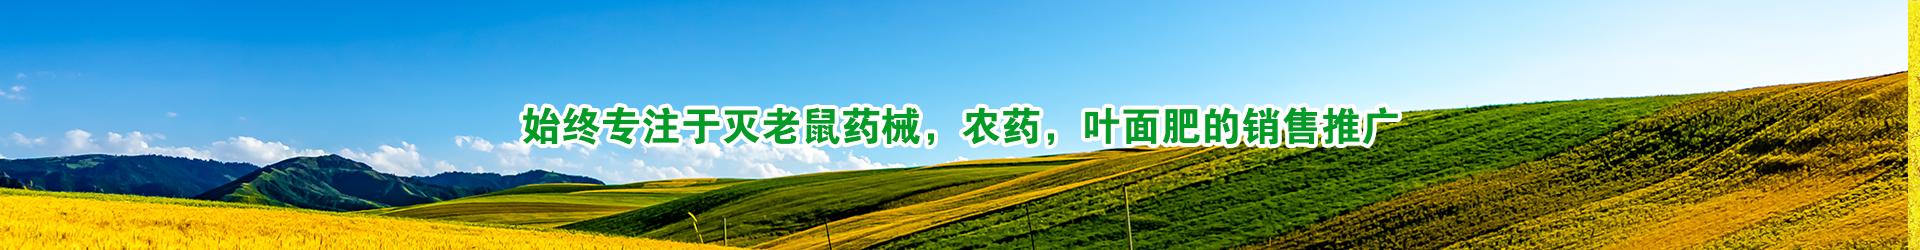 http://www.xiutiannongmu.com/data/images/slide/20190823112705_413.jpg